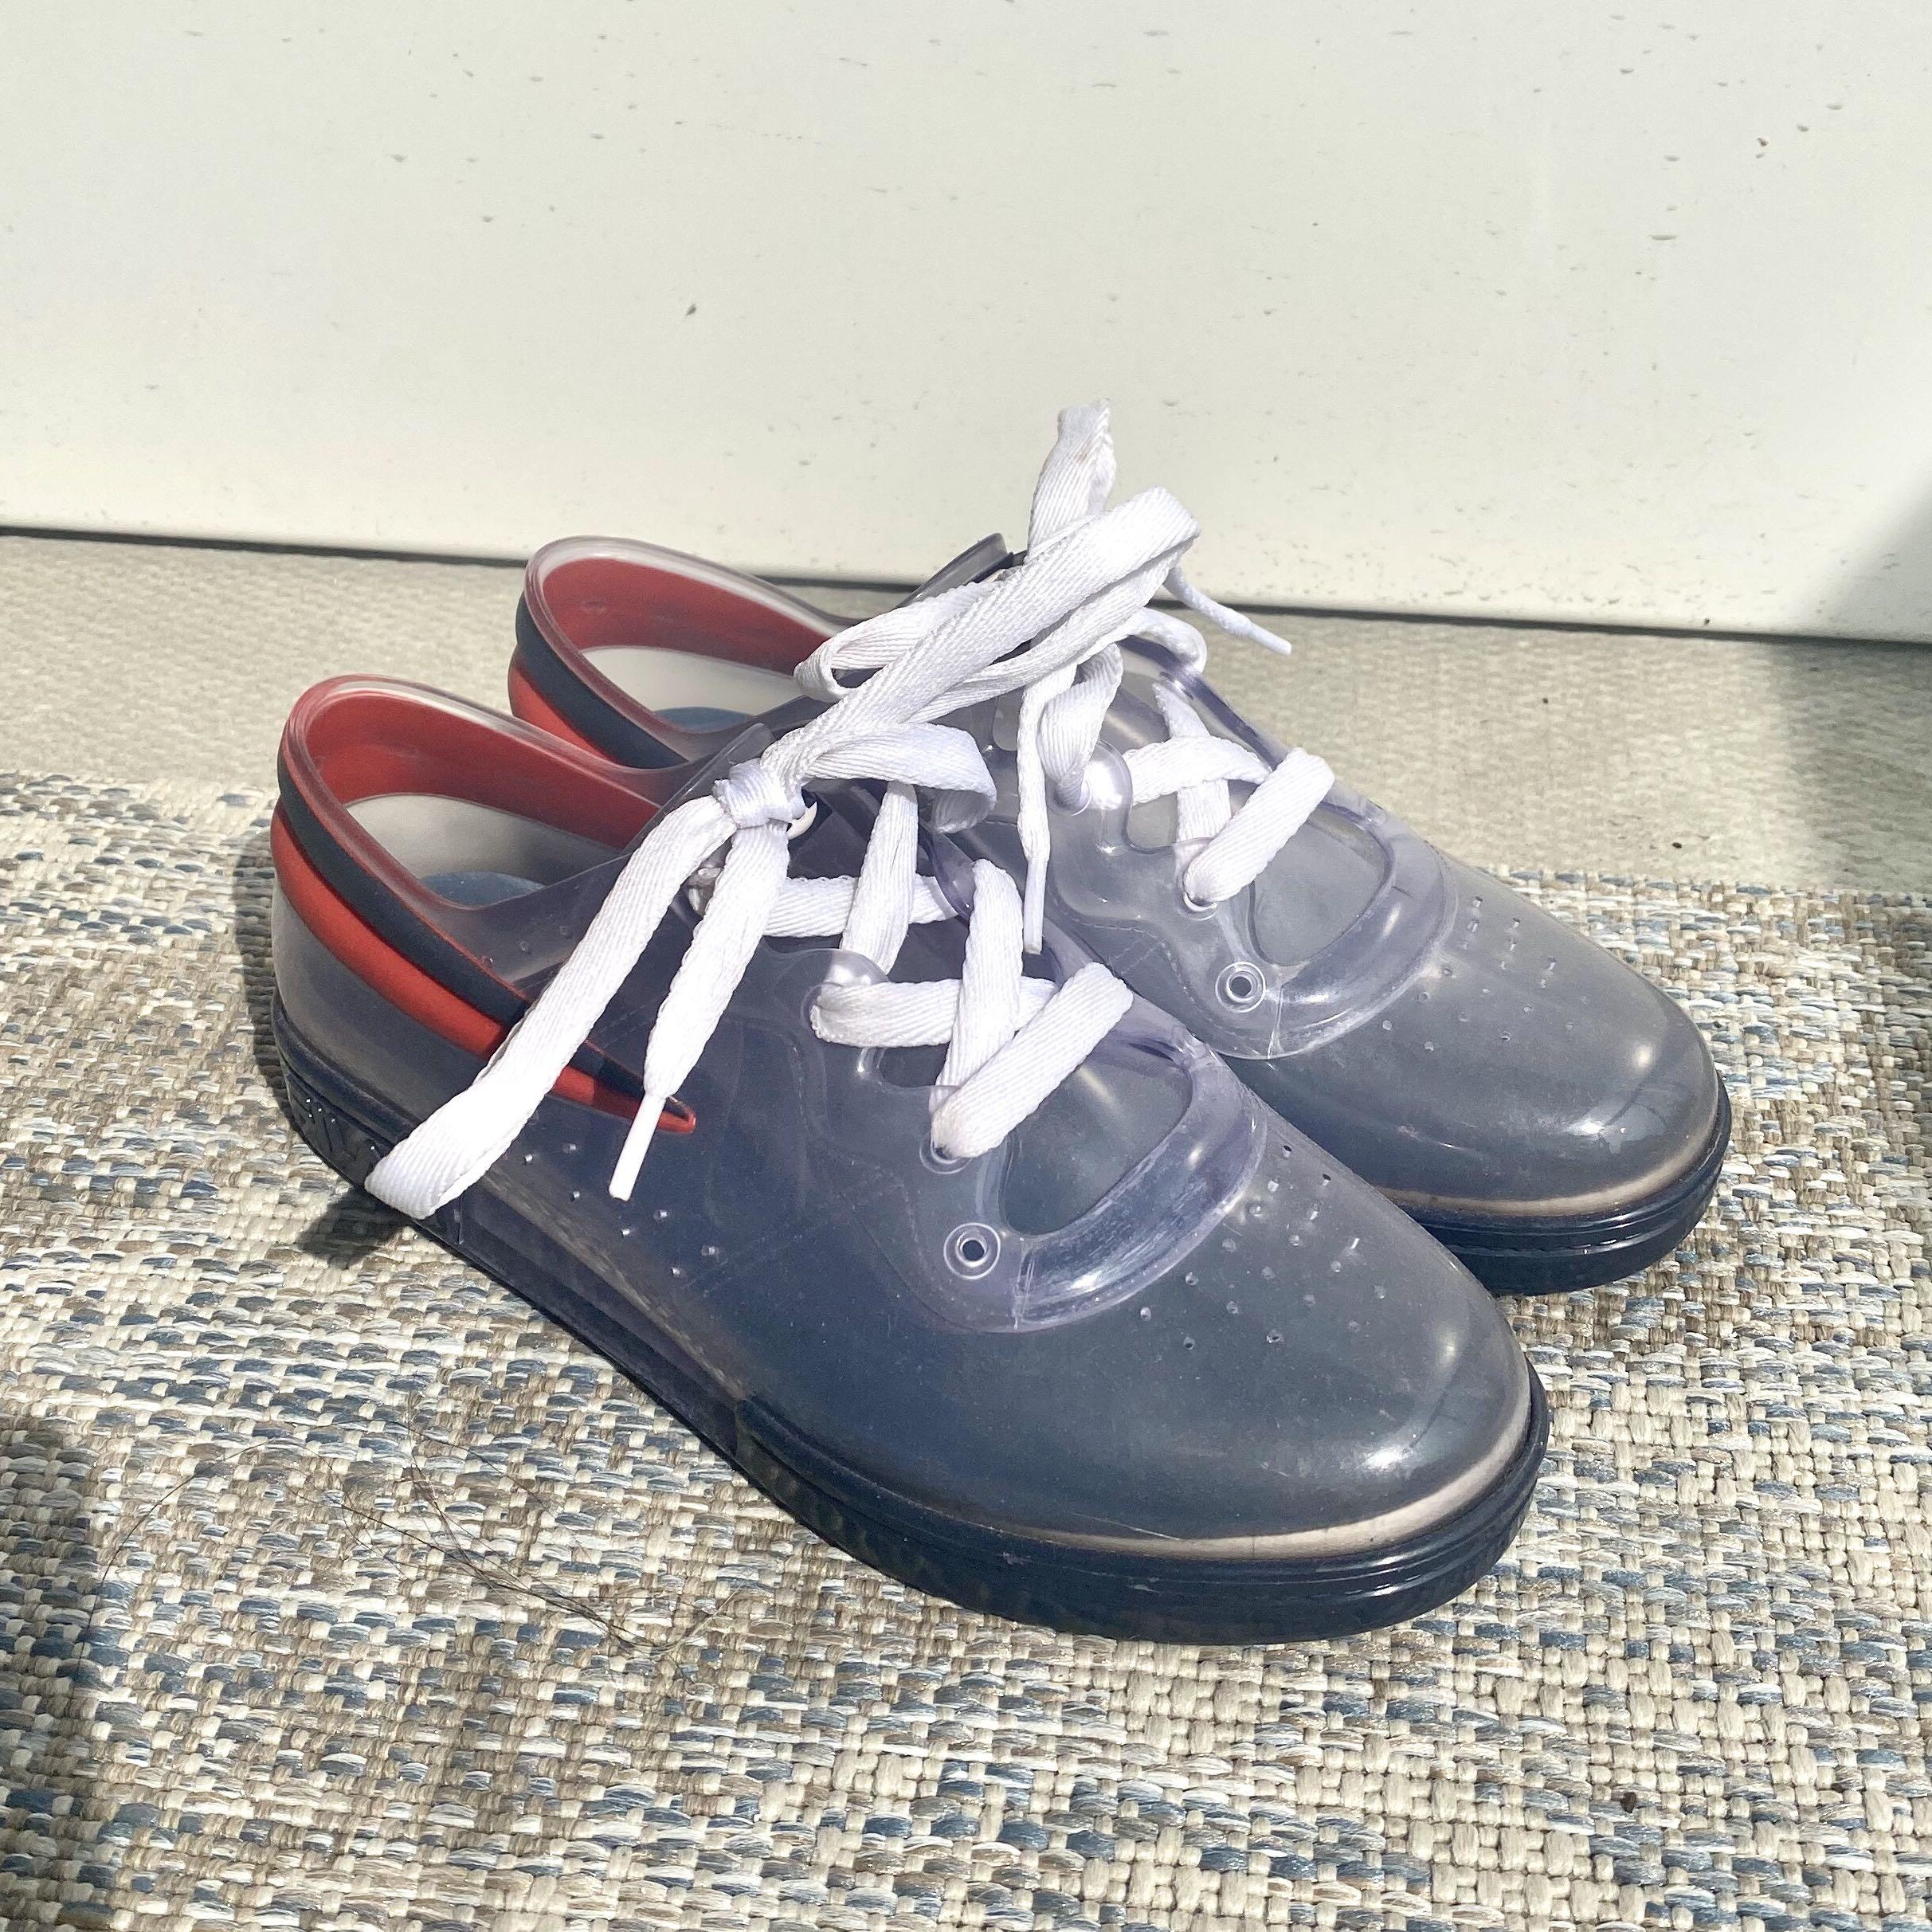 Melissa x Fila PVC Sneakers